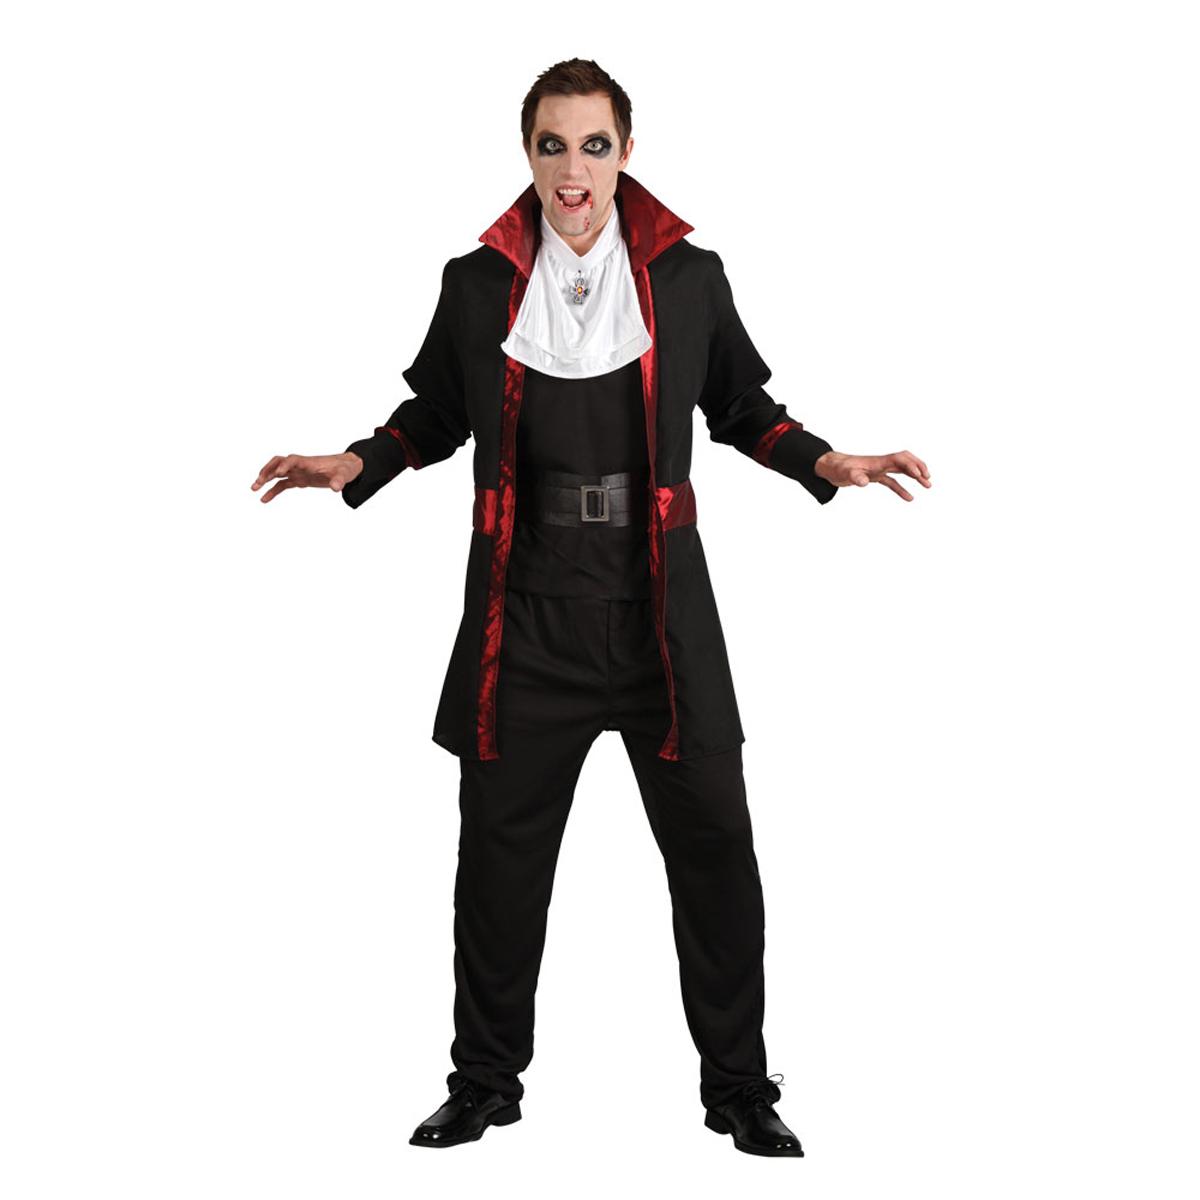 V&ire Prince Halloween Costume  sc 1 st  Mega Fancy Dress & Vampire Prince Halloween Costume | All Mens Halloween Costumes ...